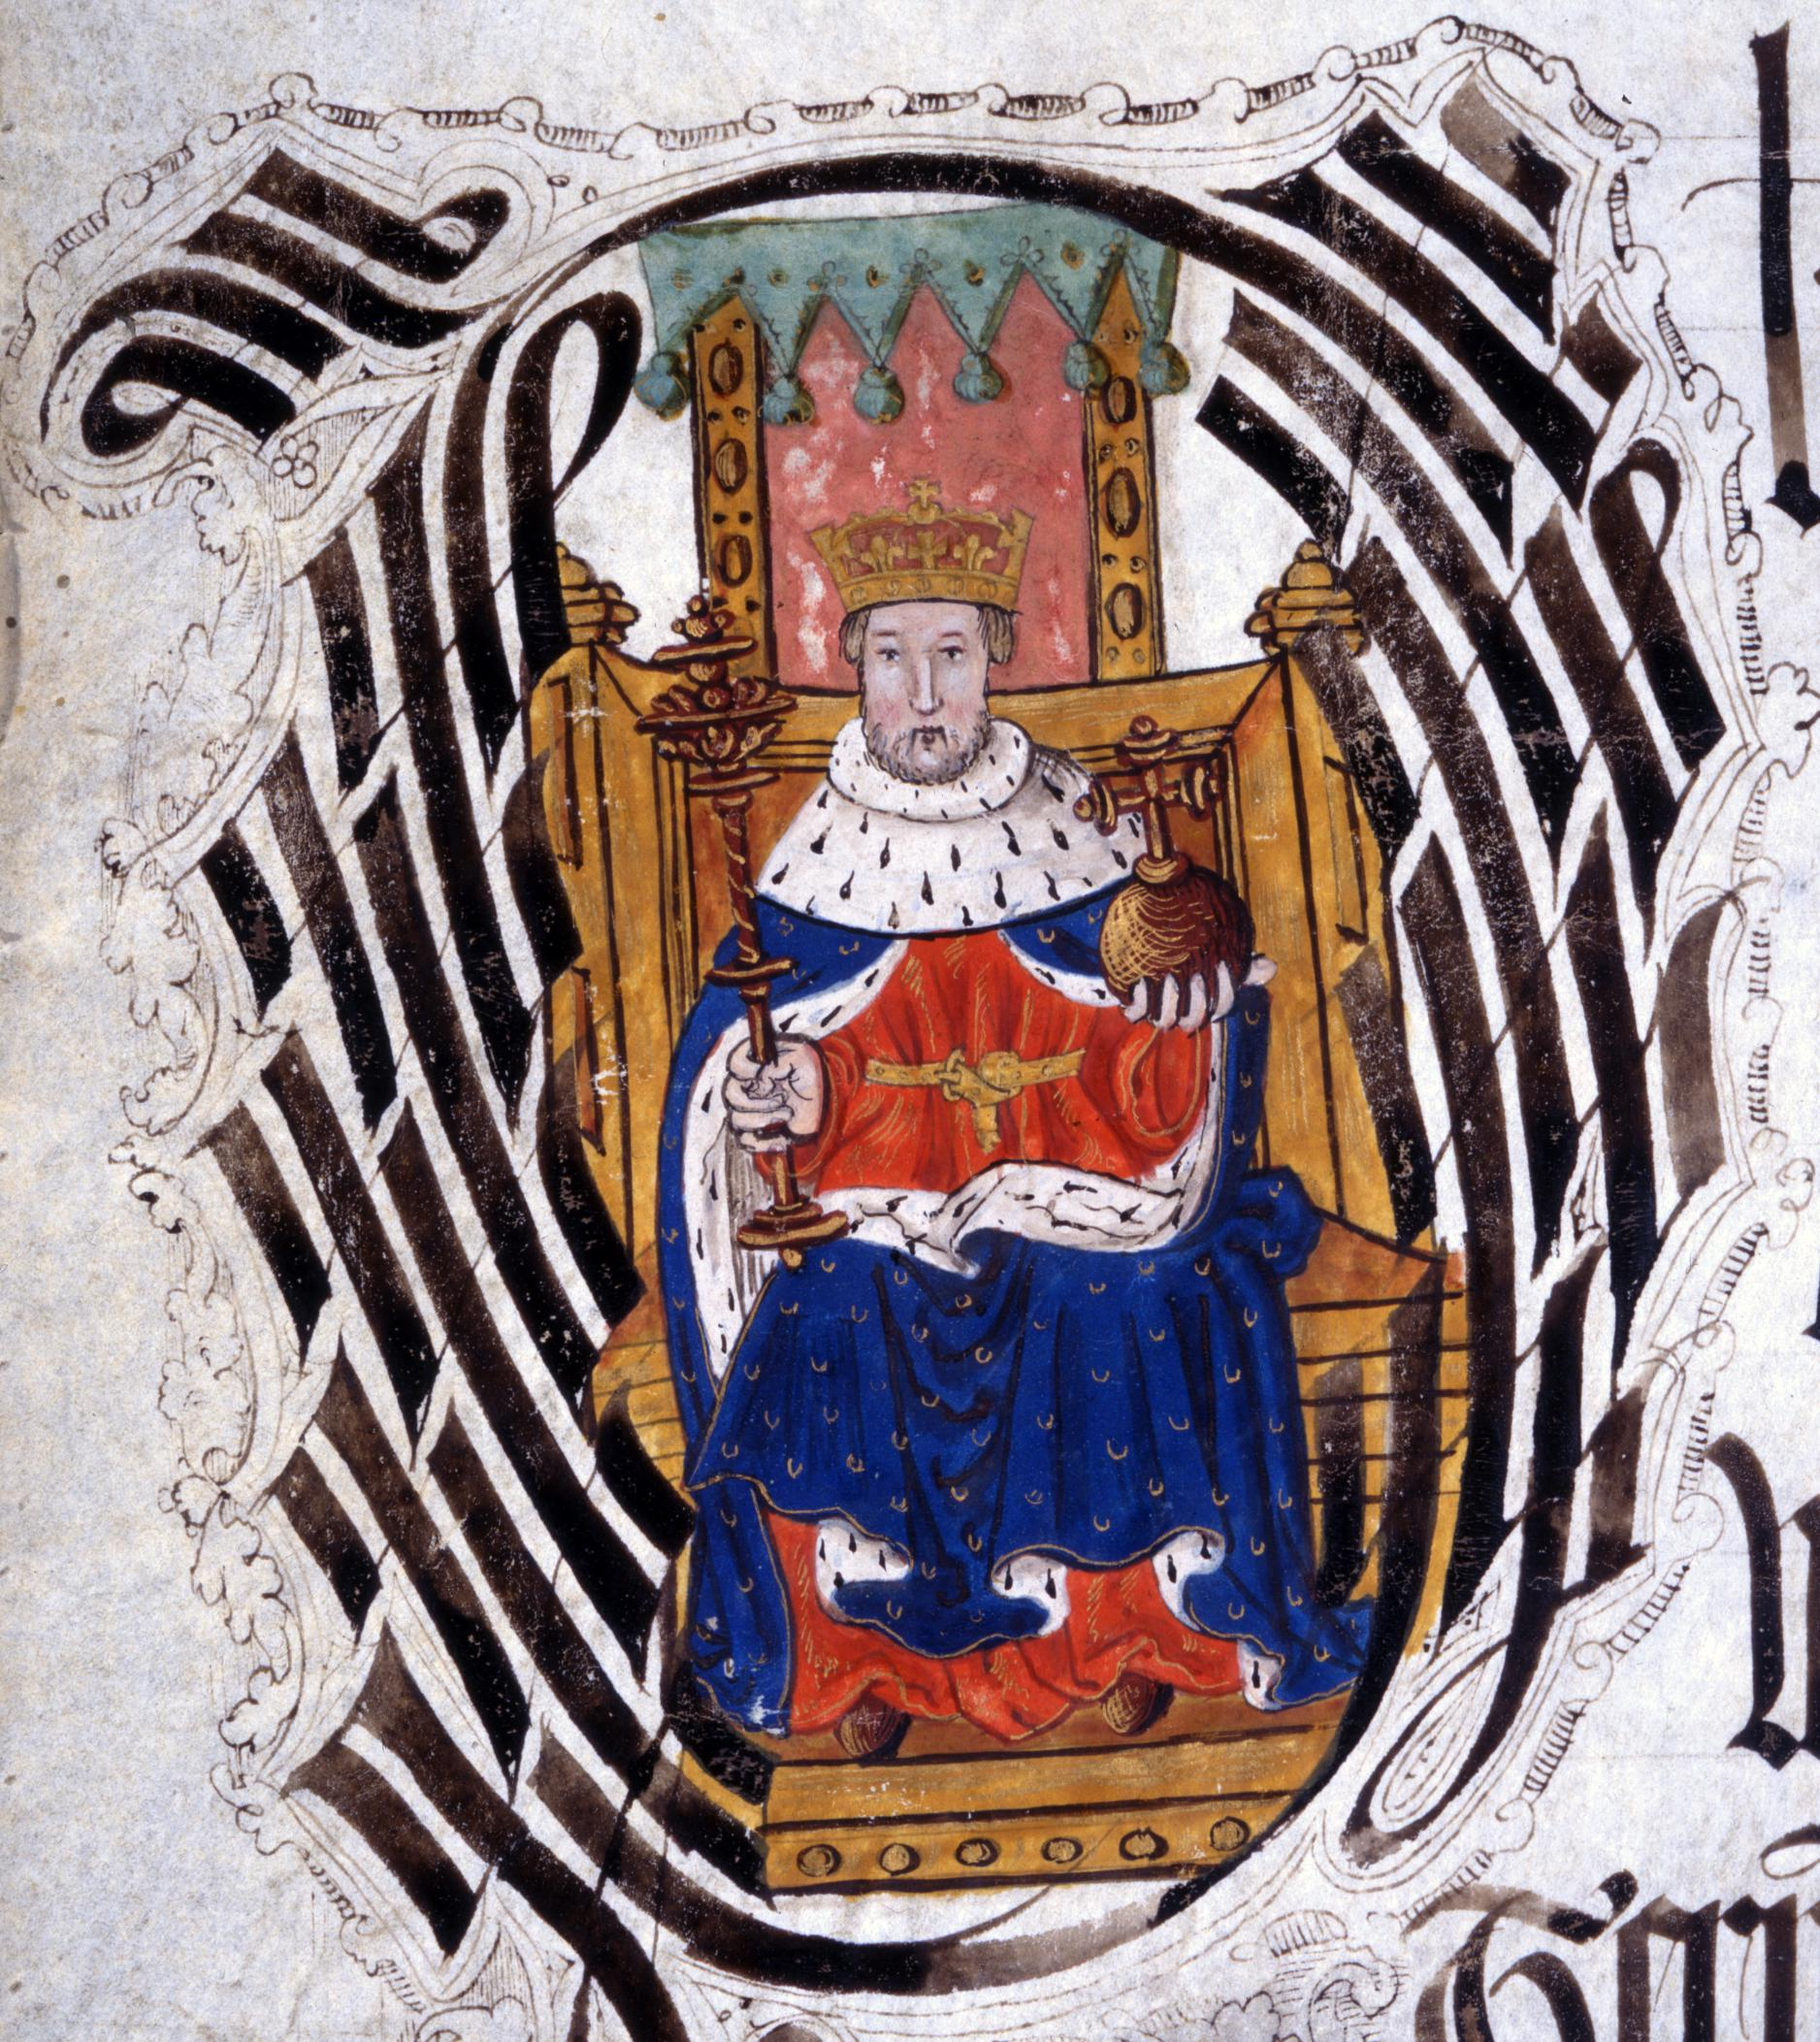 KB 27/1119/2 Henry VIII Initial Detail